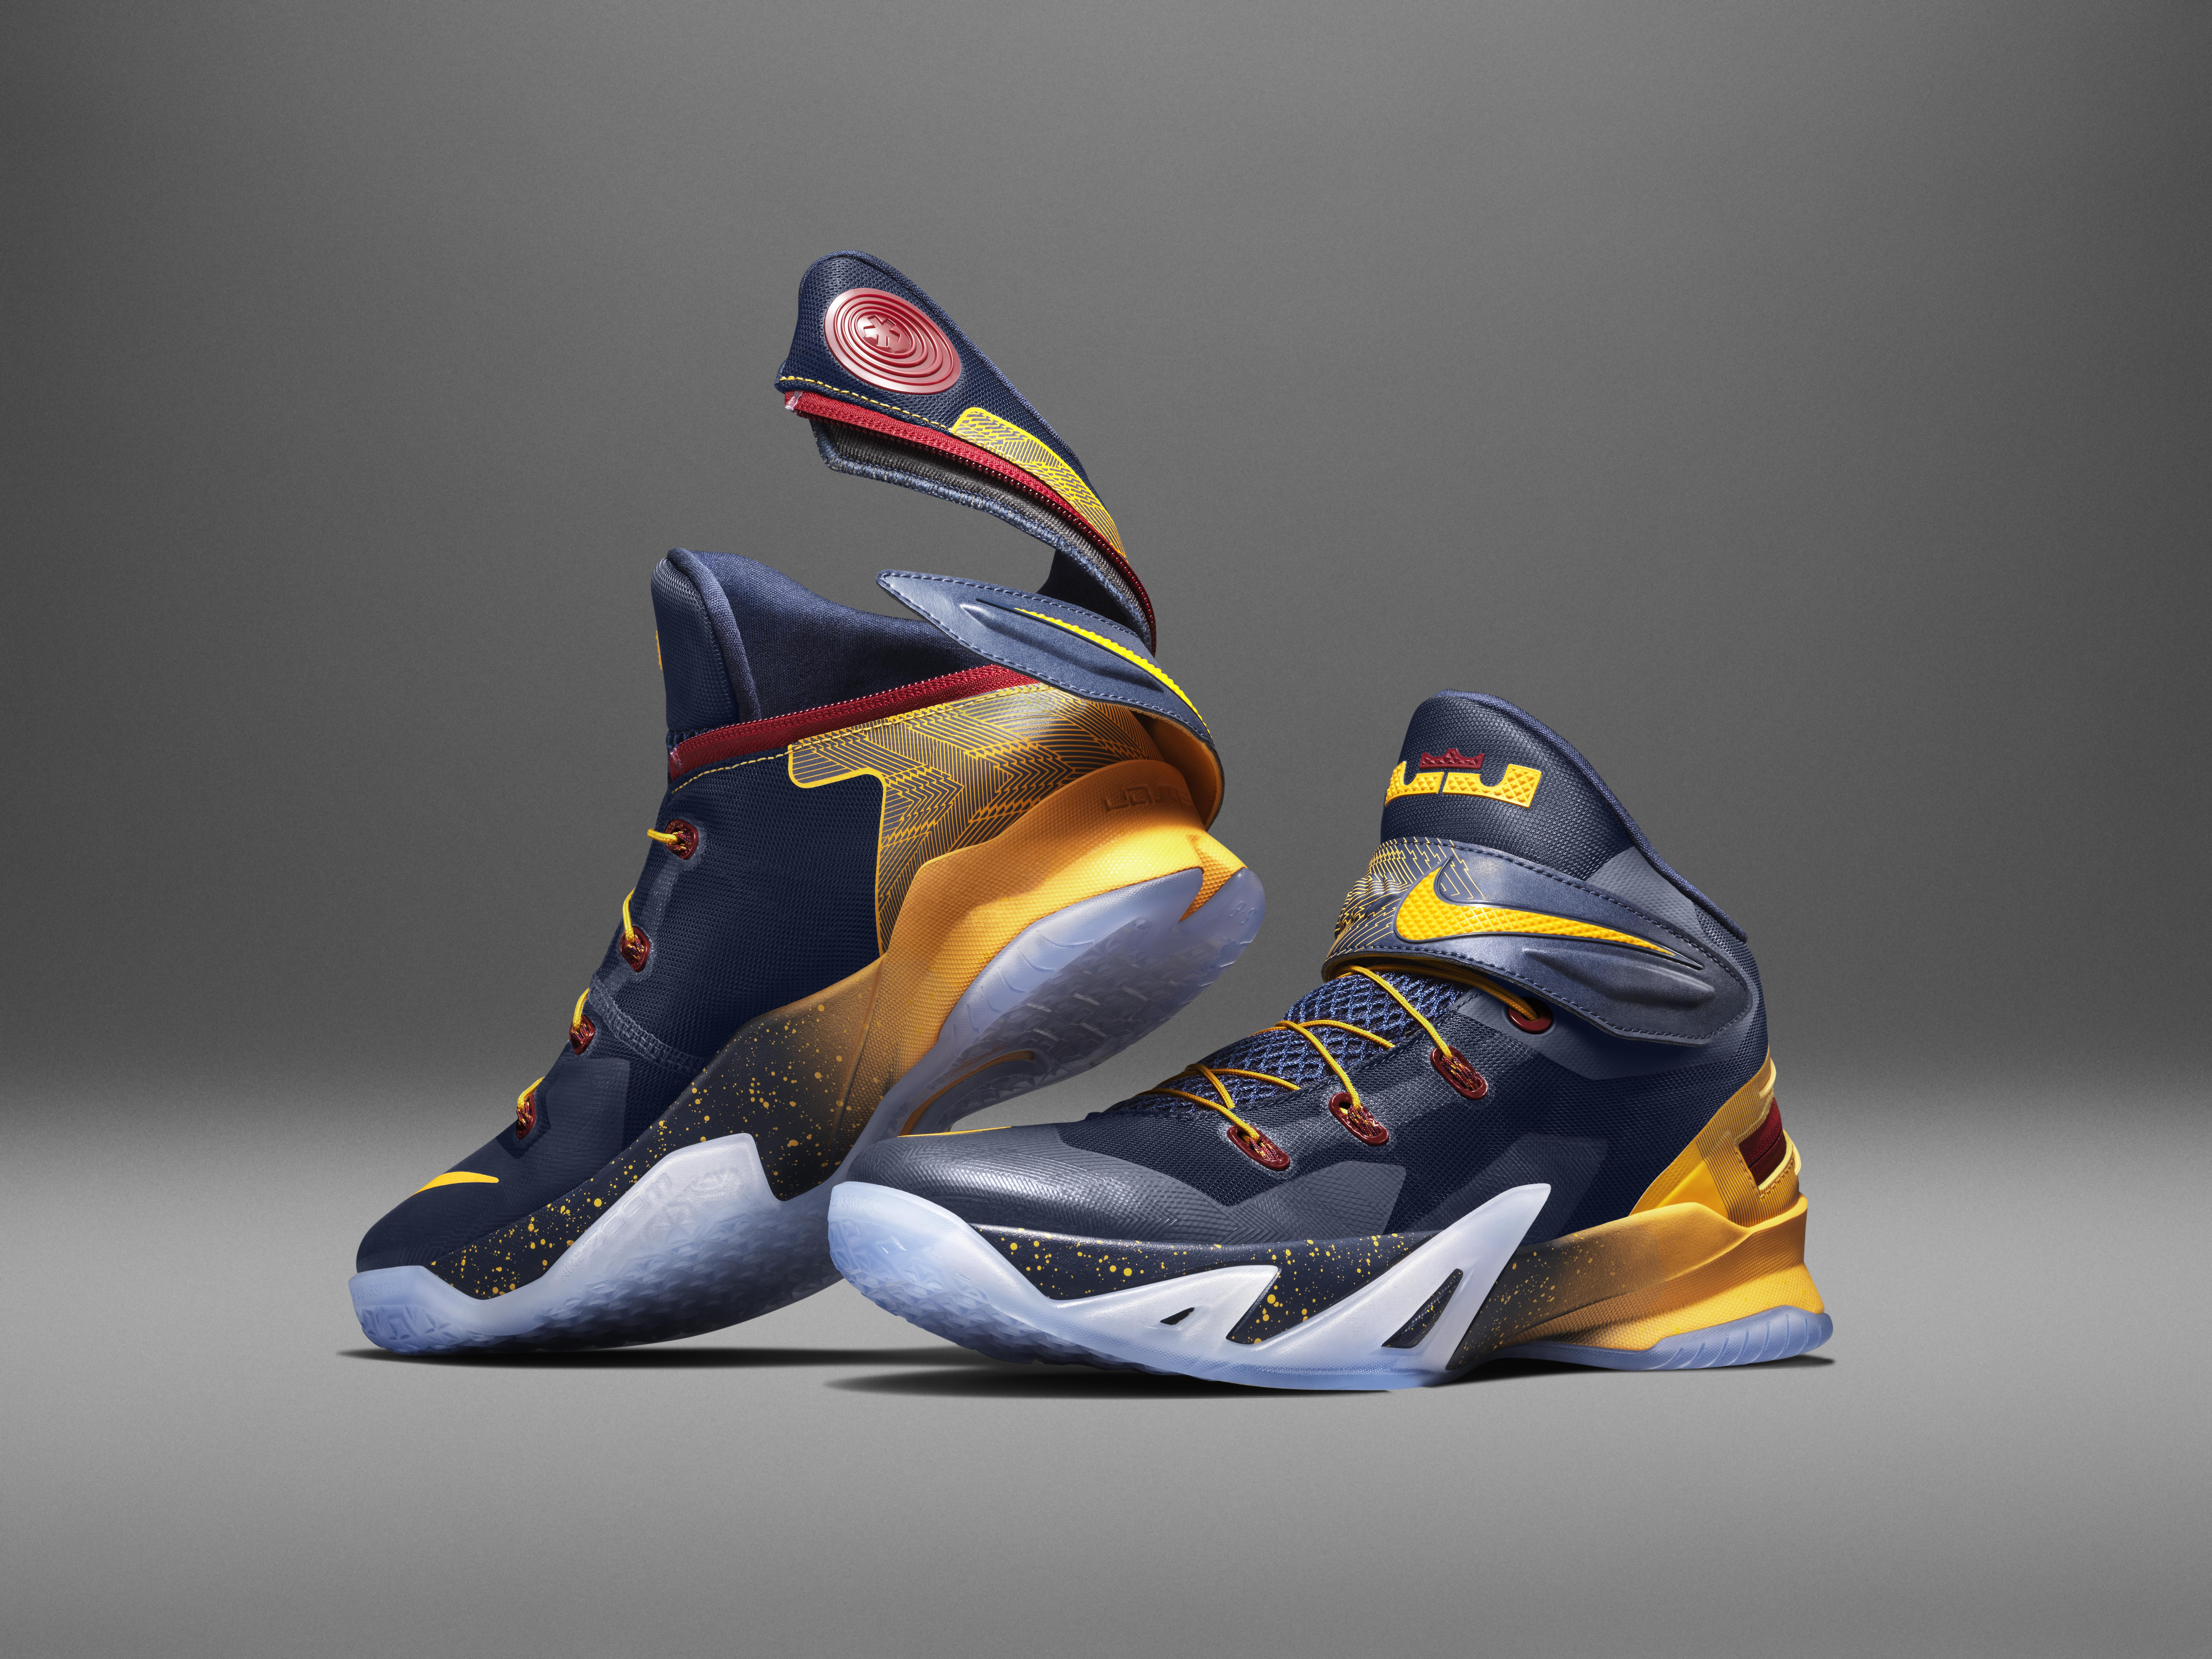 lebron nike shoes 2015 nike sock boots orange